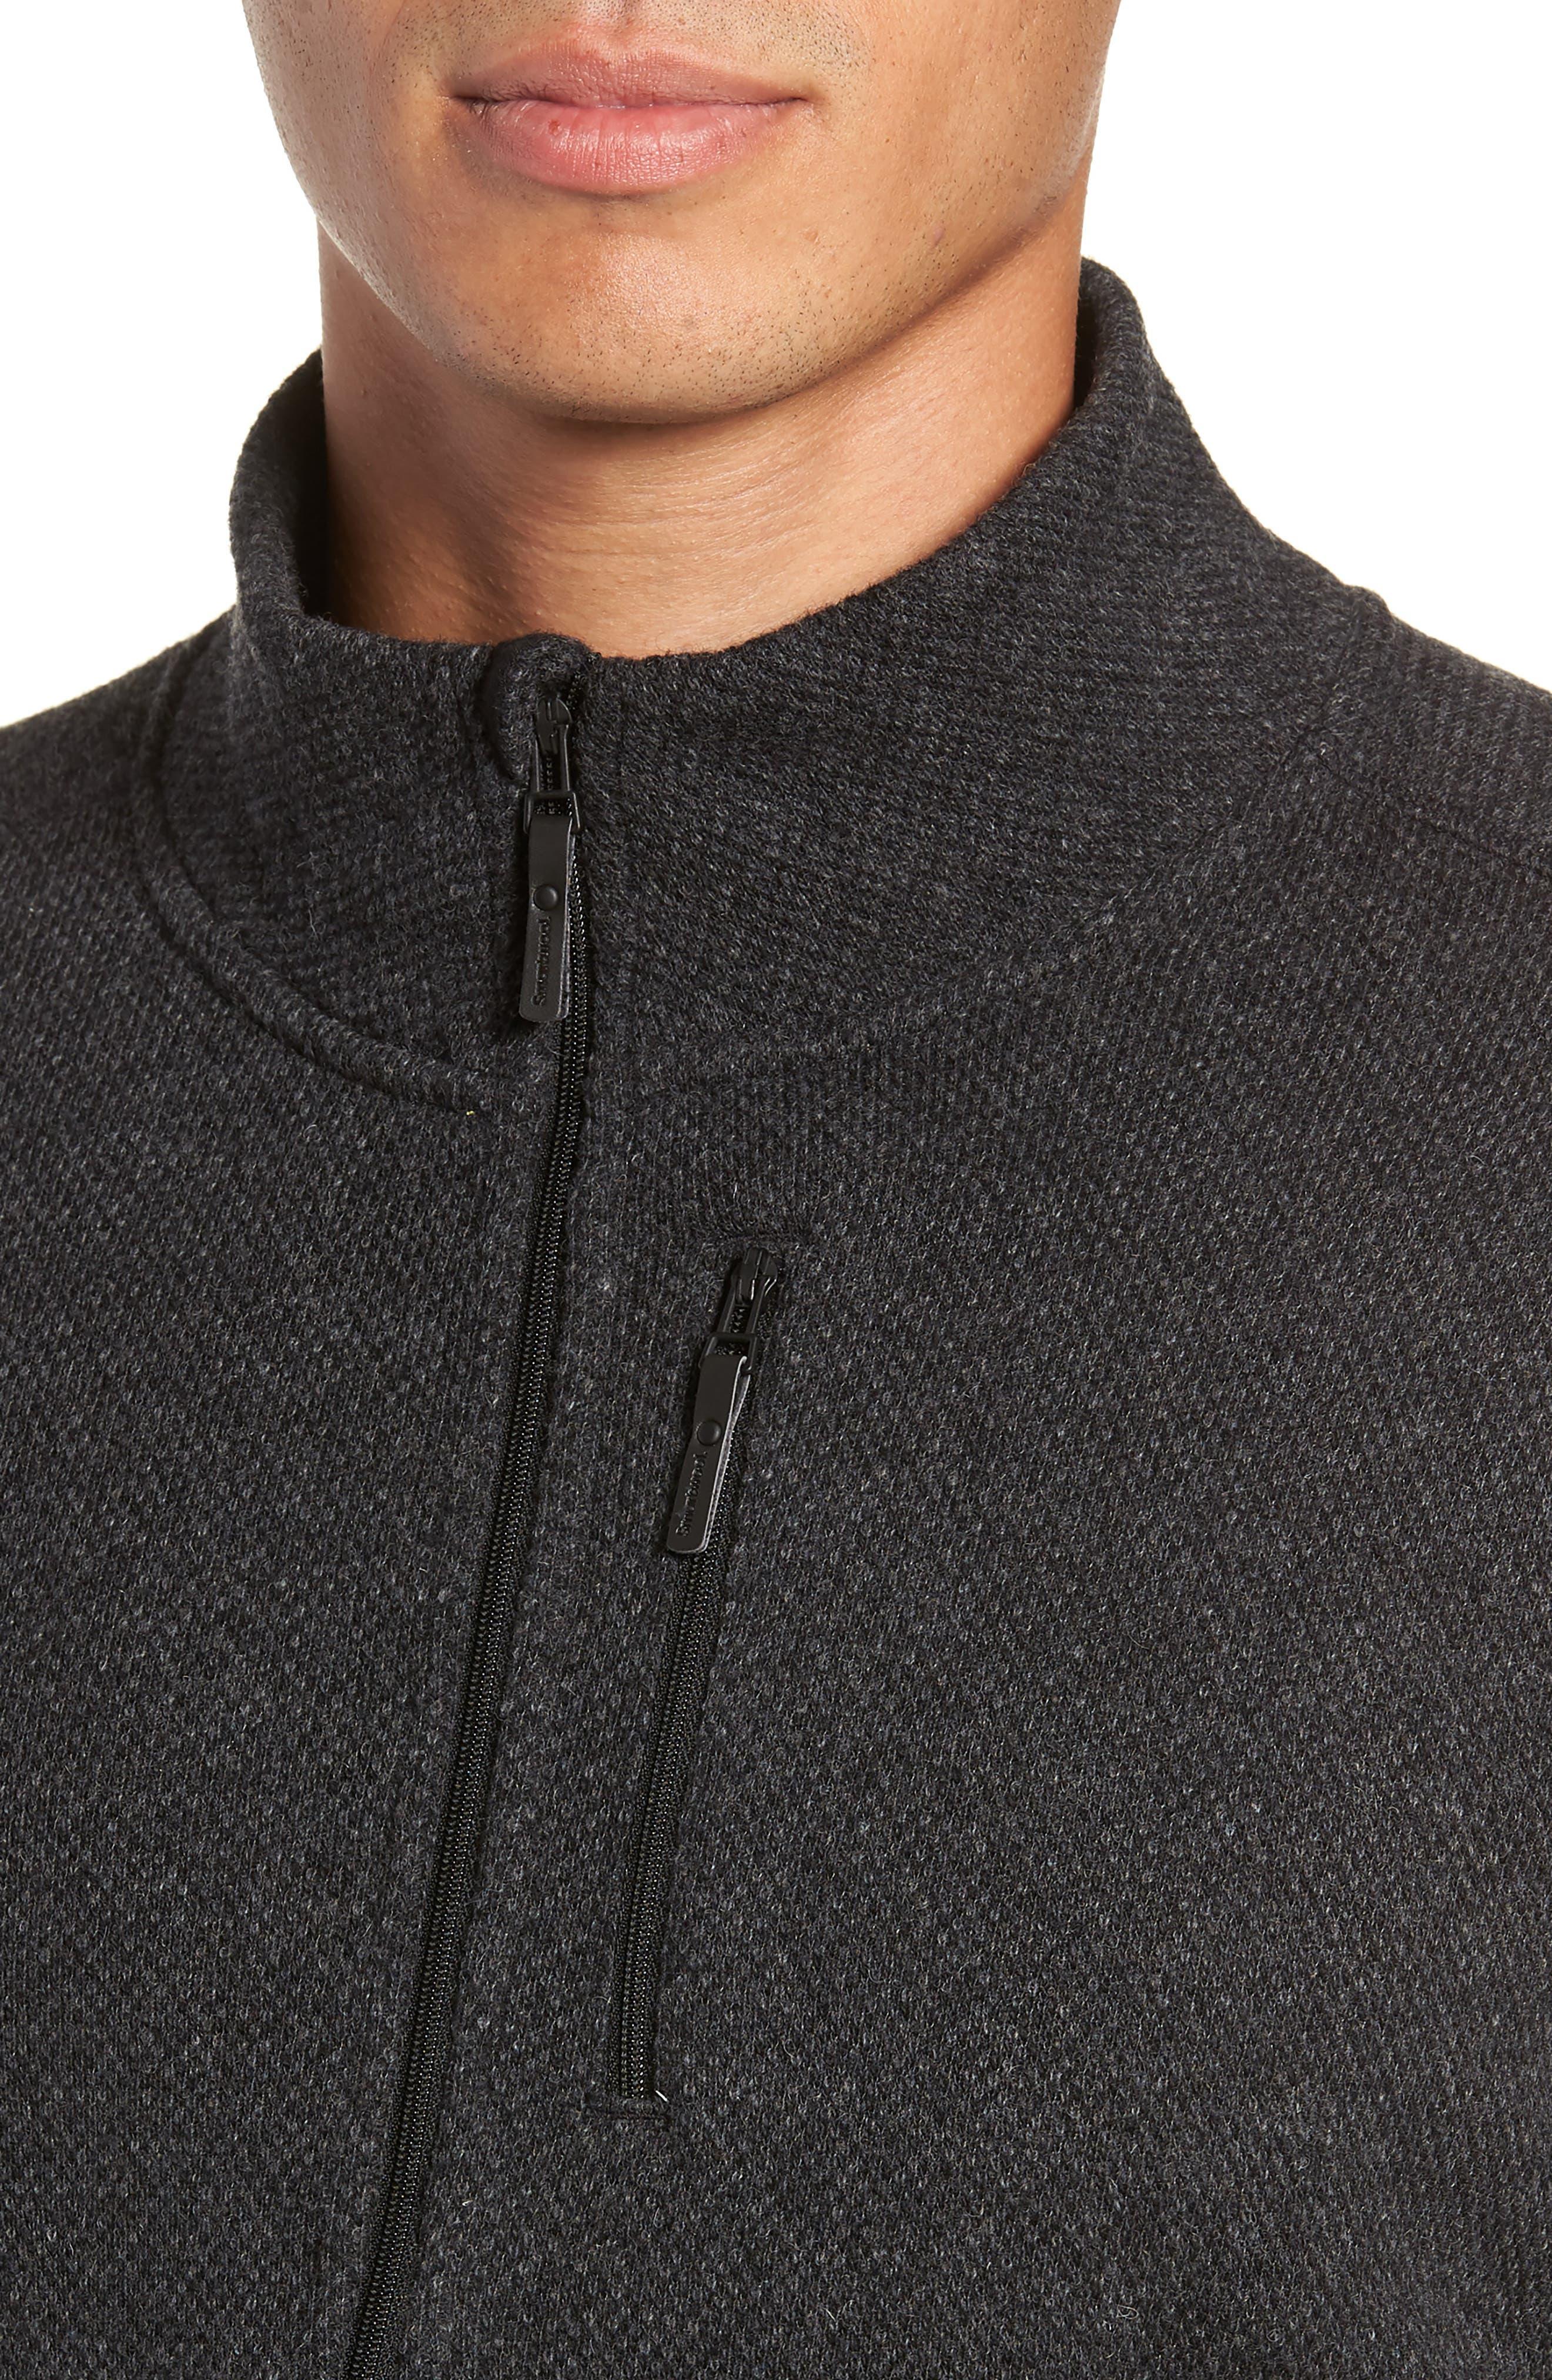 Hudson Trail Regular Fit Fleece Half-Zip Sweater,                             Alternate thumbnail 4, color,                             020